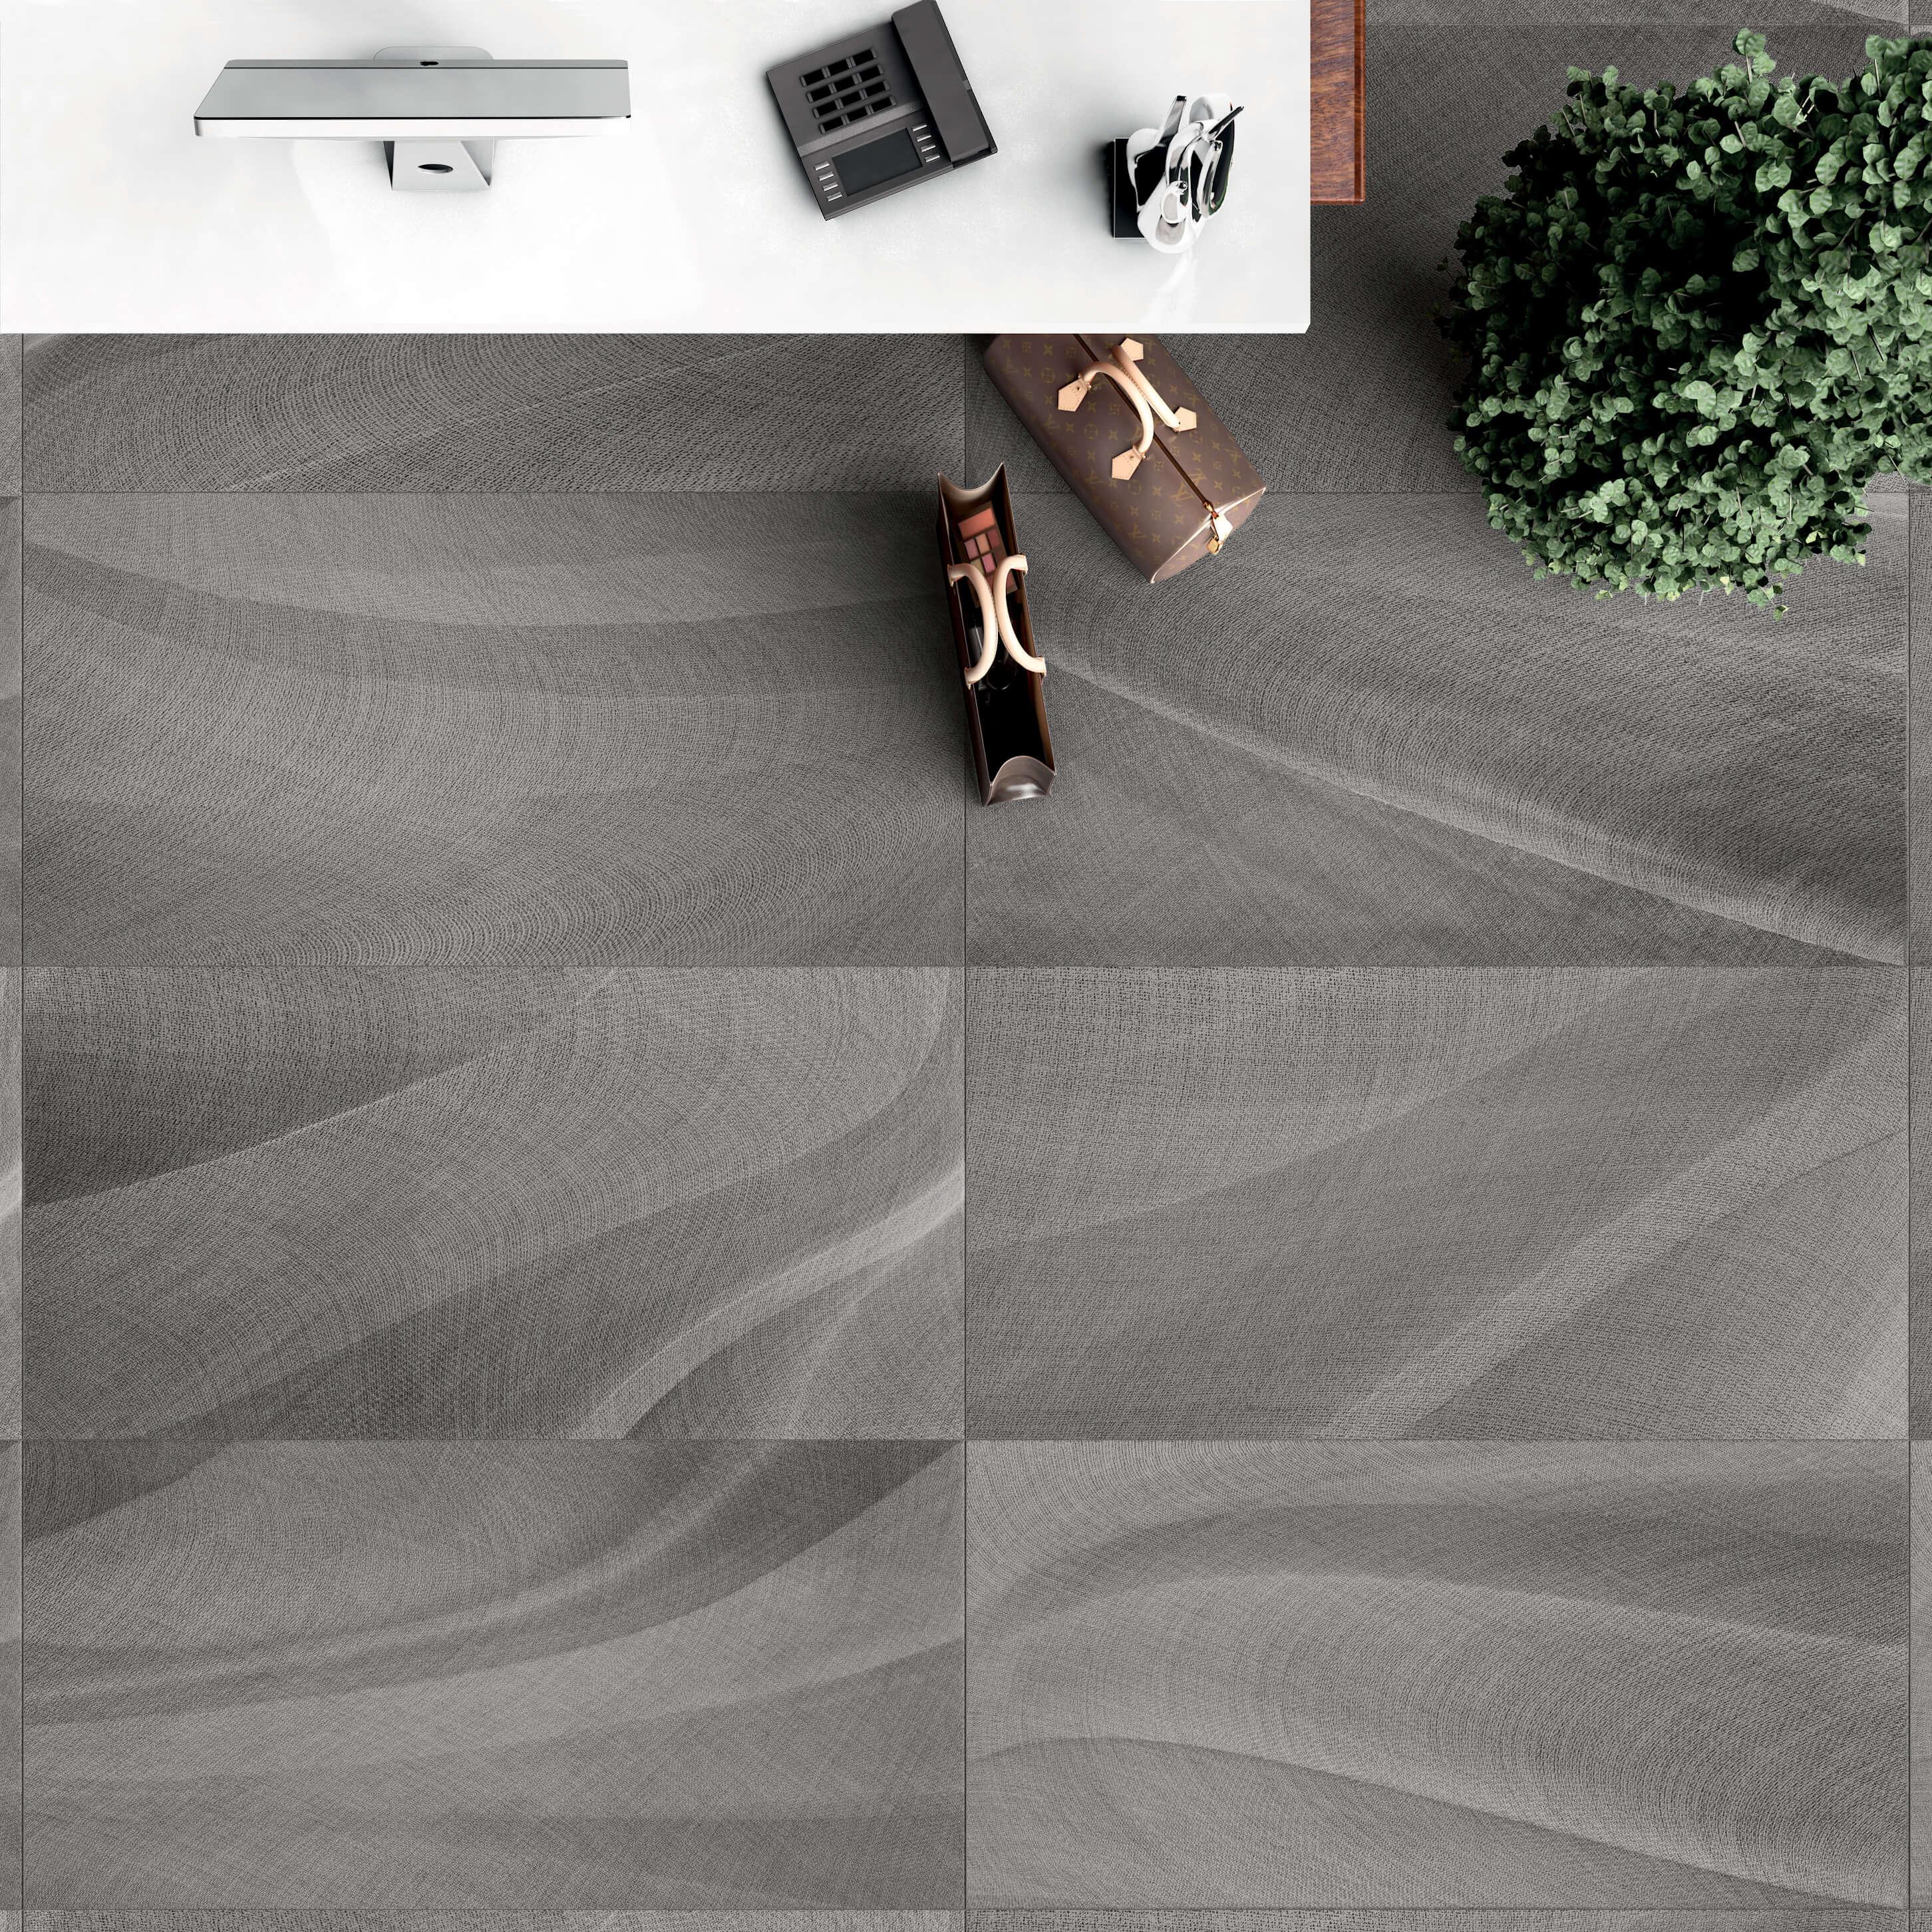 Texture Tiles Singapore Malford Ceramics Pte Ltd